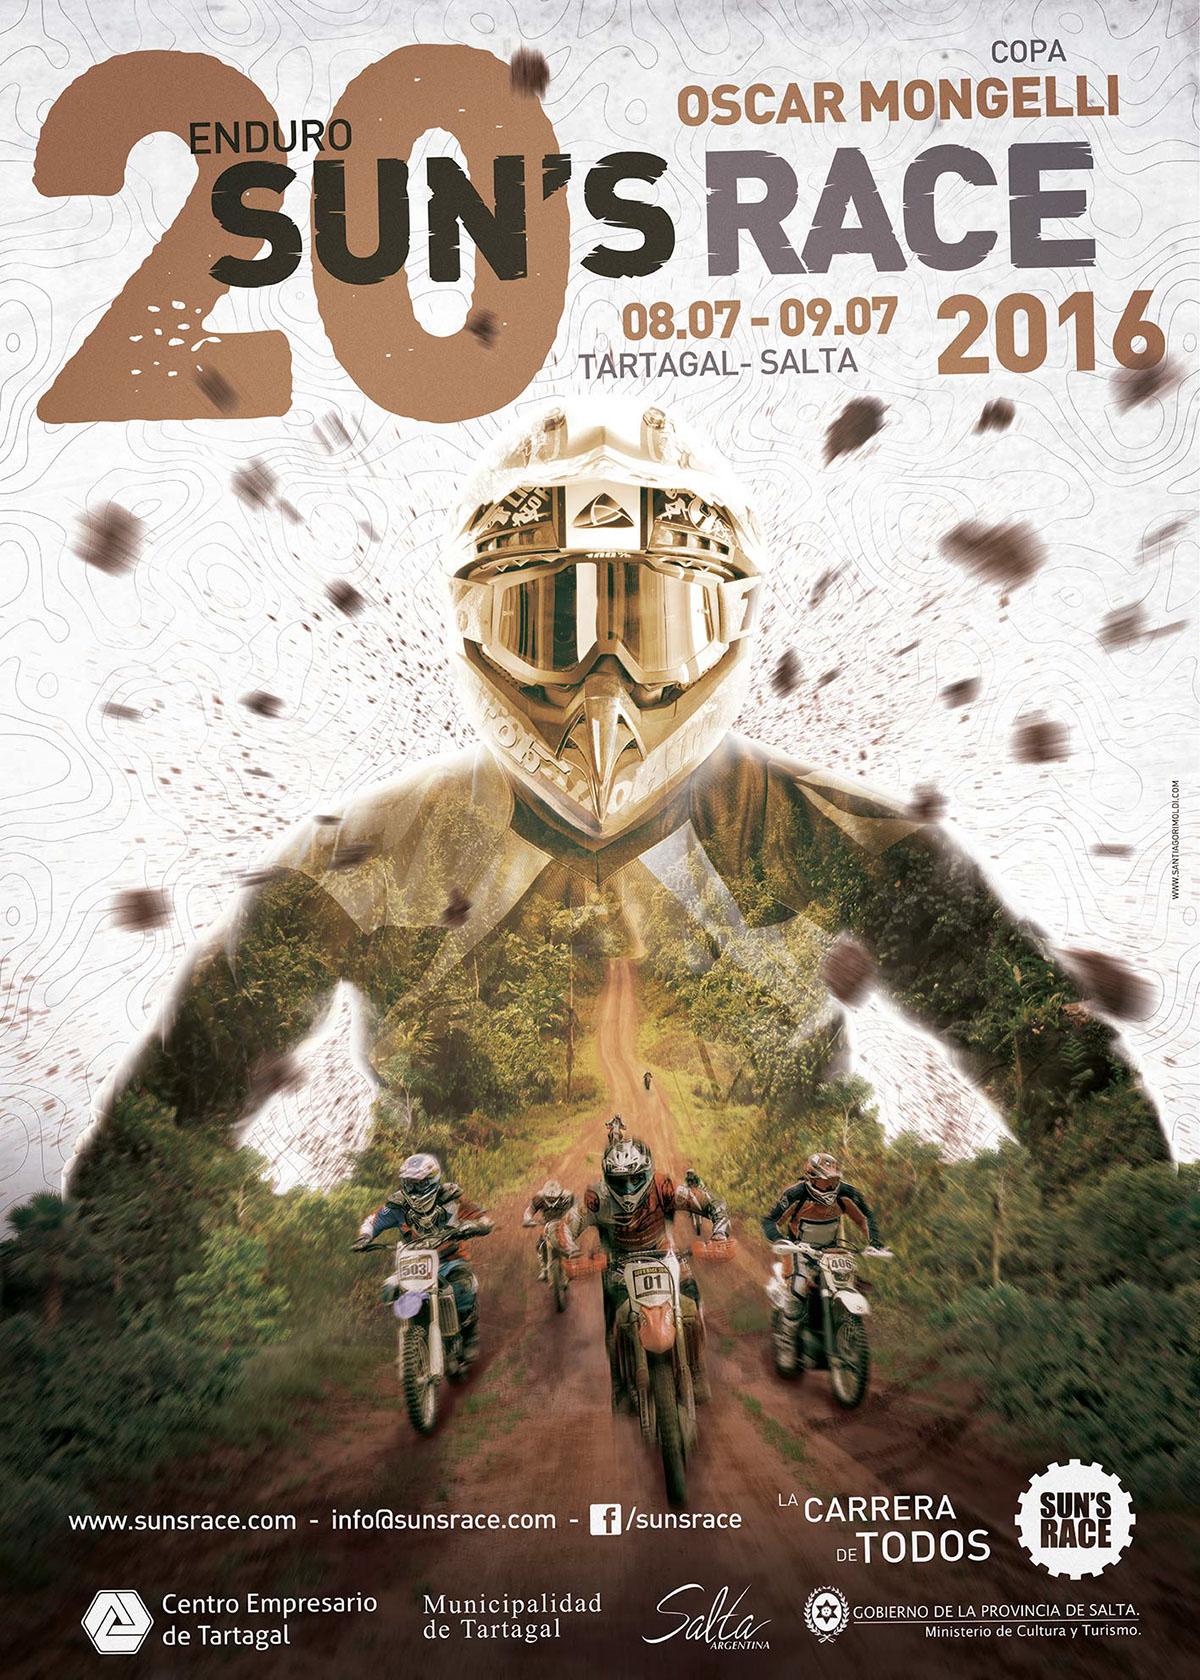 Sun's Race 2016 by Santiago Rimoldi on Inspirationde